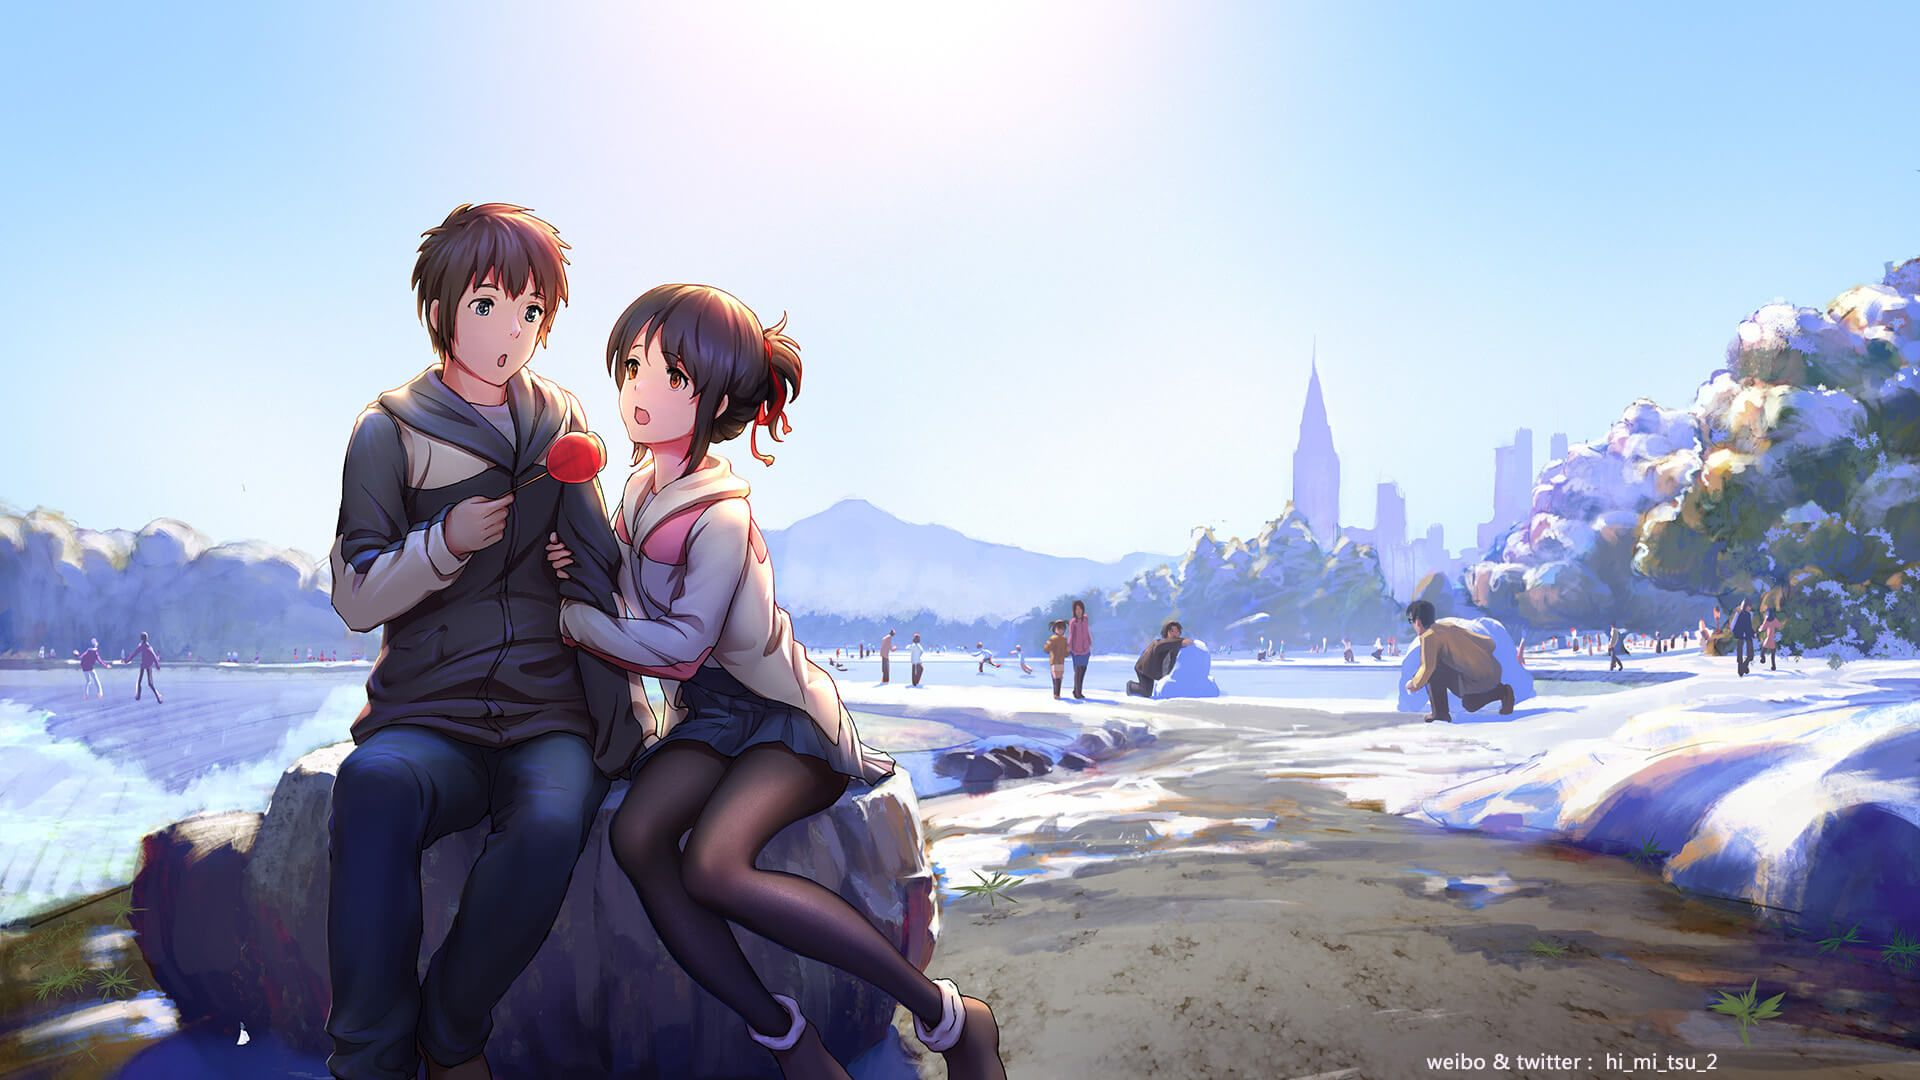 Taki Mitsuha (Kimi no na wa) (Có hình ảnh) Fans, Anime